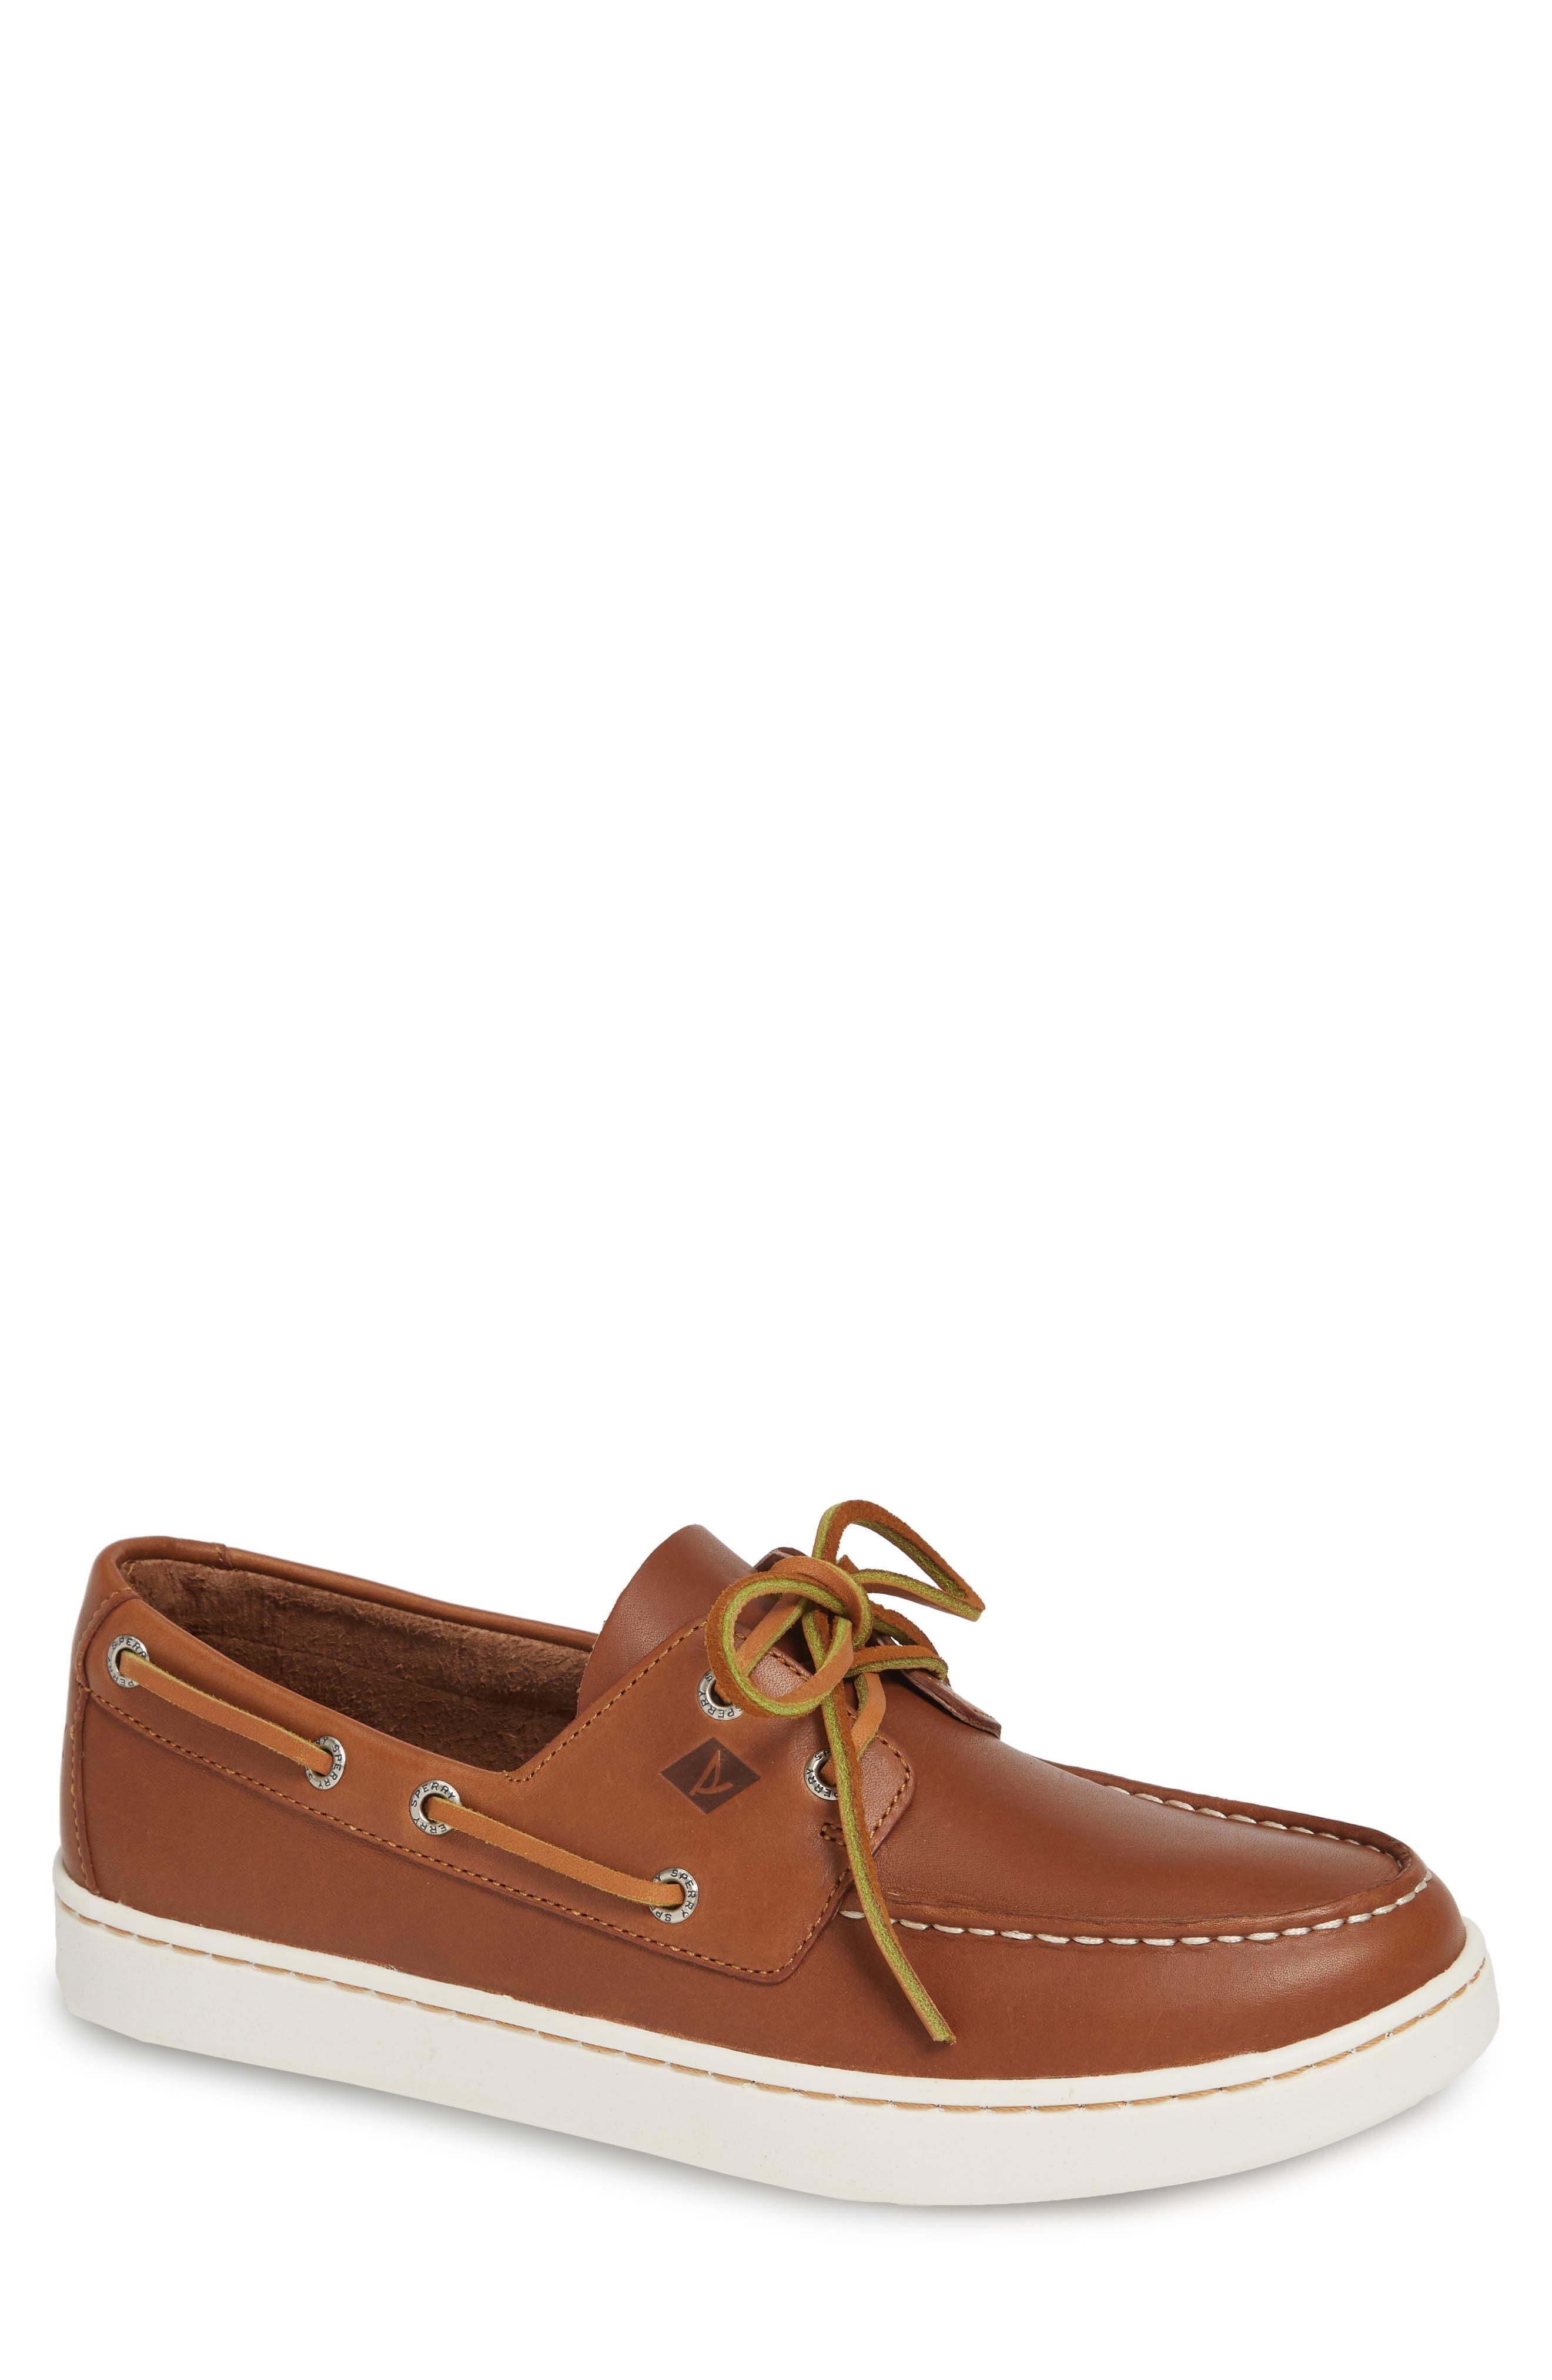 Cup Boat Shoe, Main, color, TAN